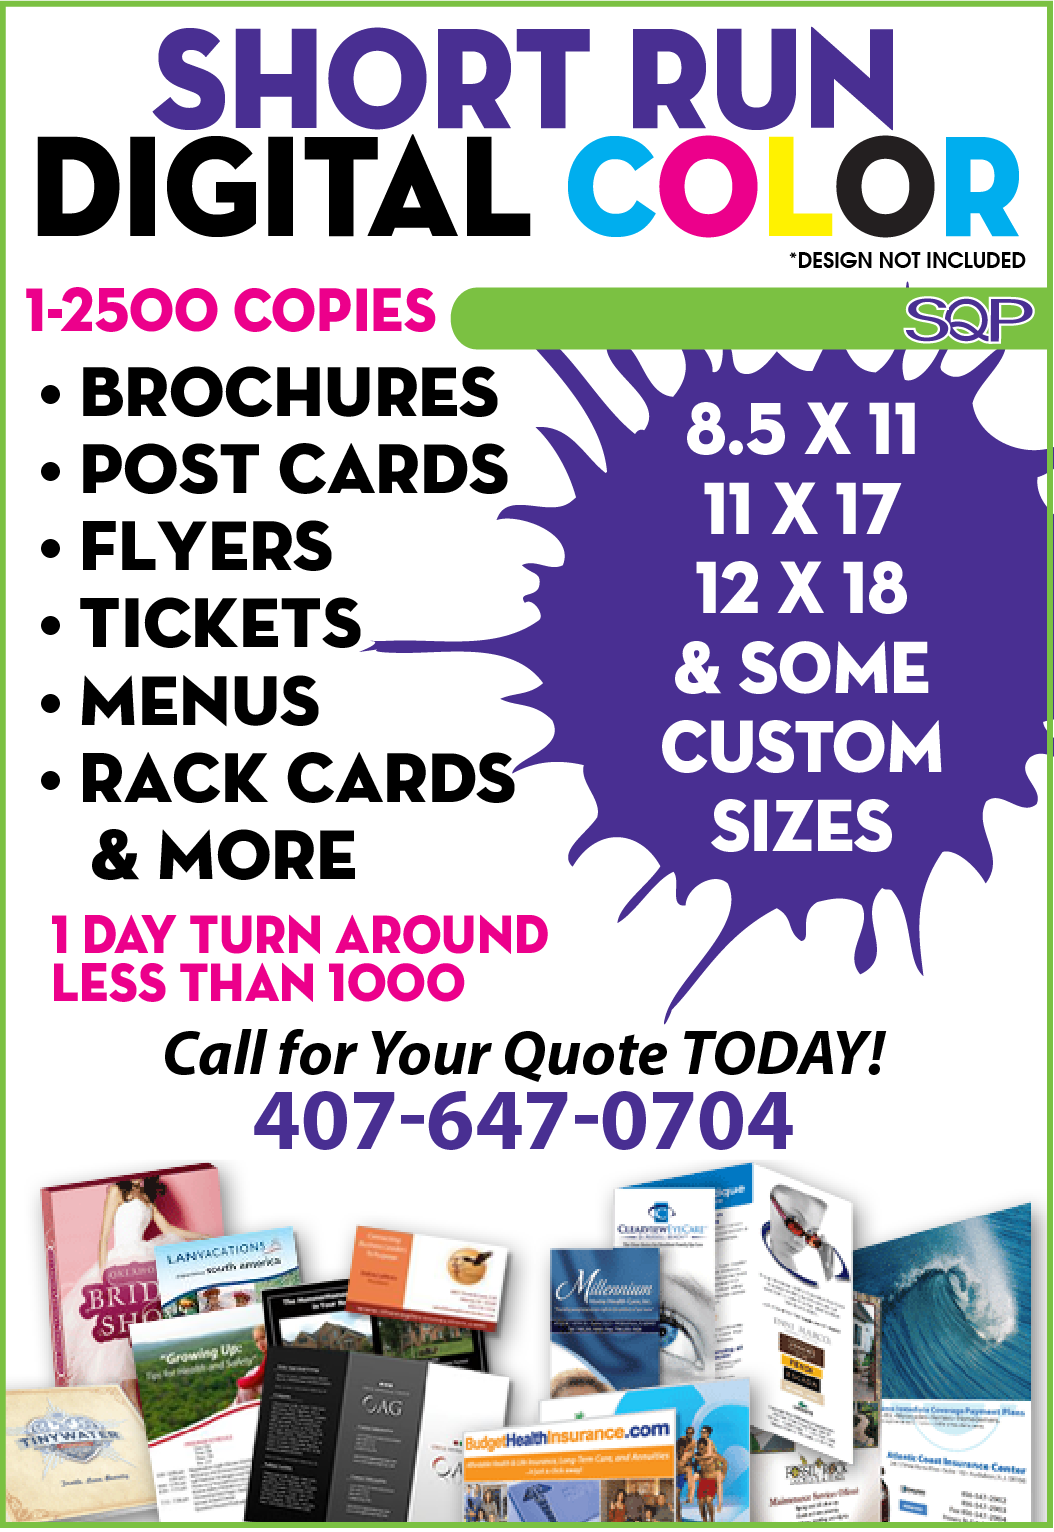 Speedy Quick Printing Center image 16